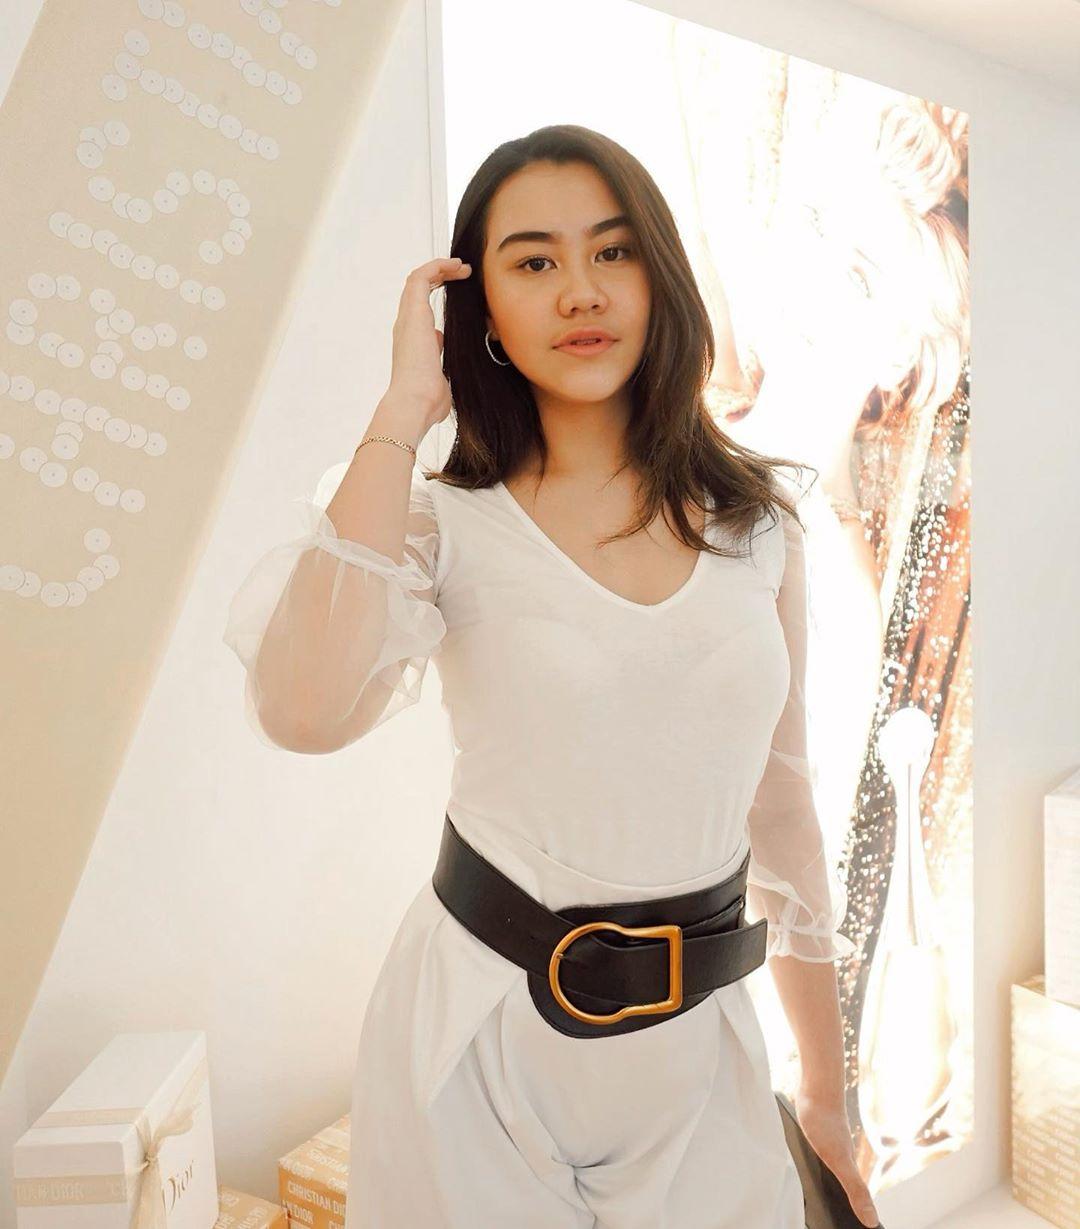 6 Anak Perempuan Artis Indonesia yang Tampil Fashionable